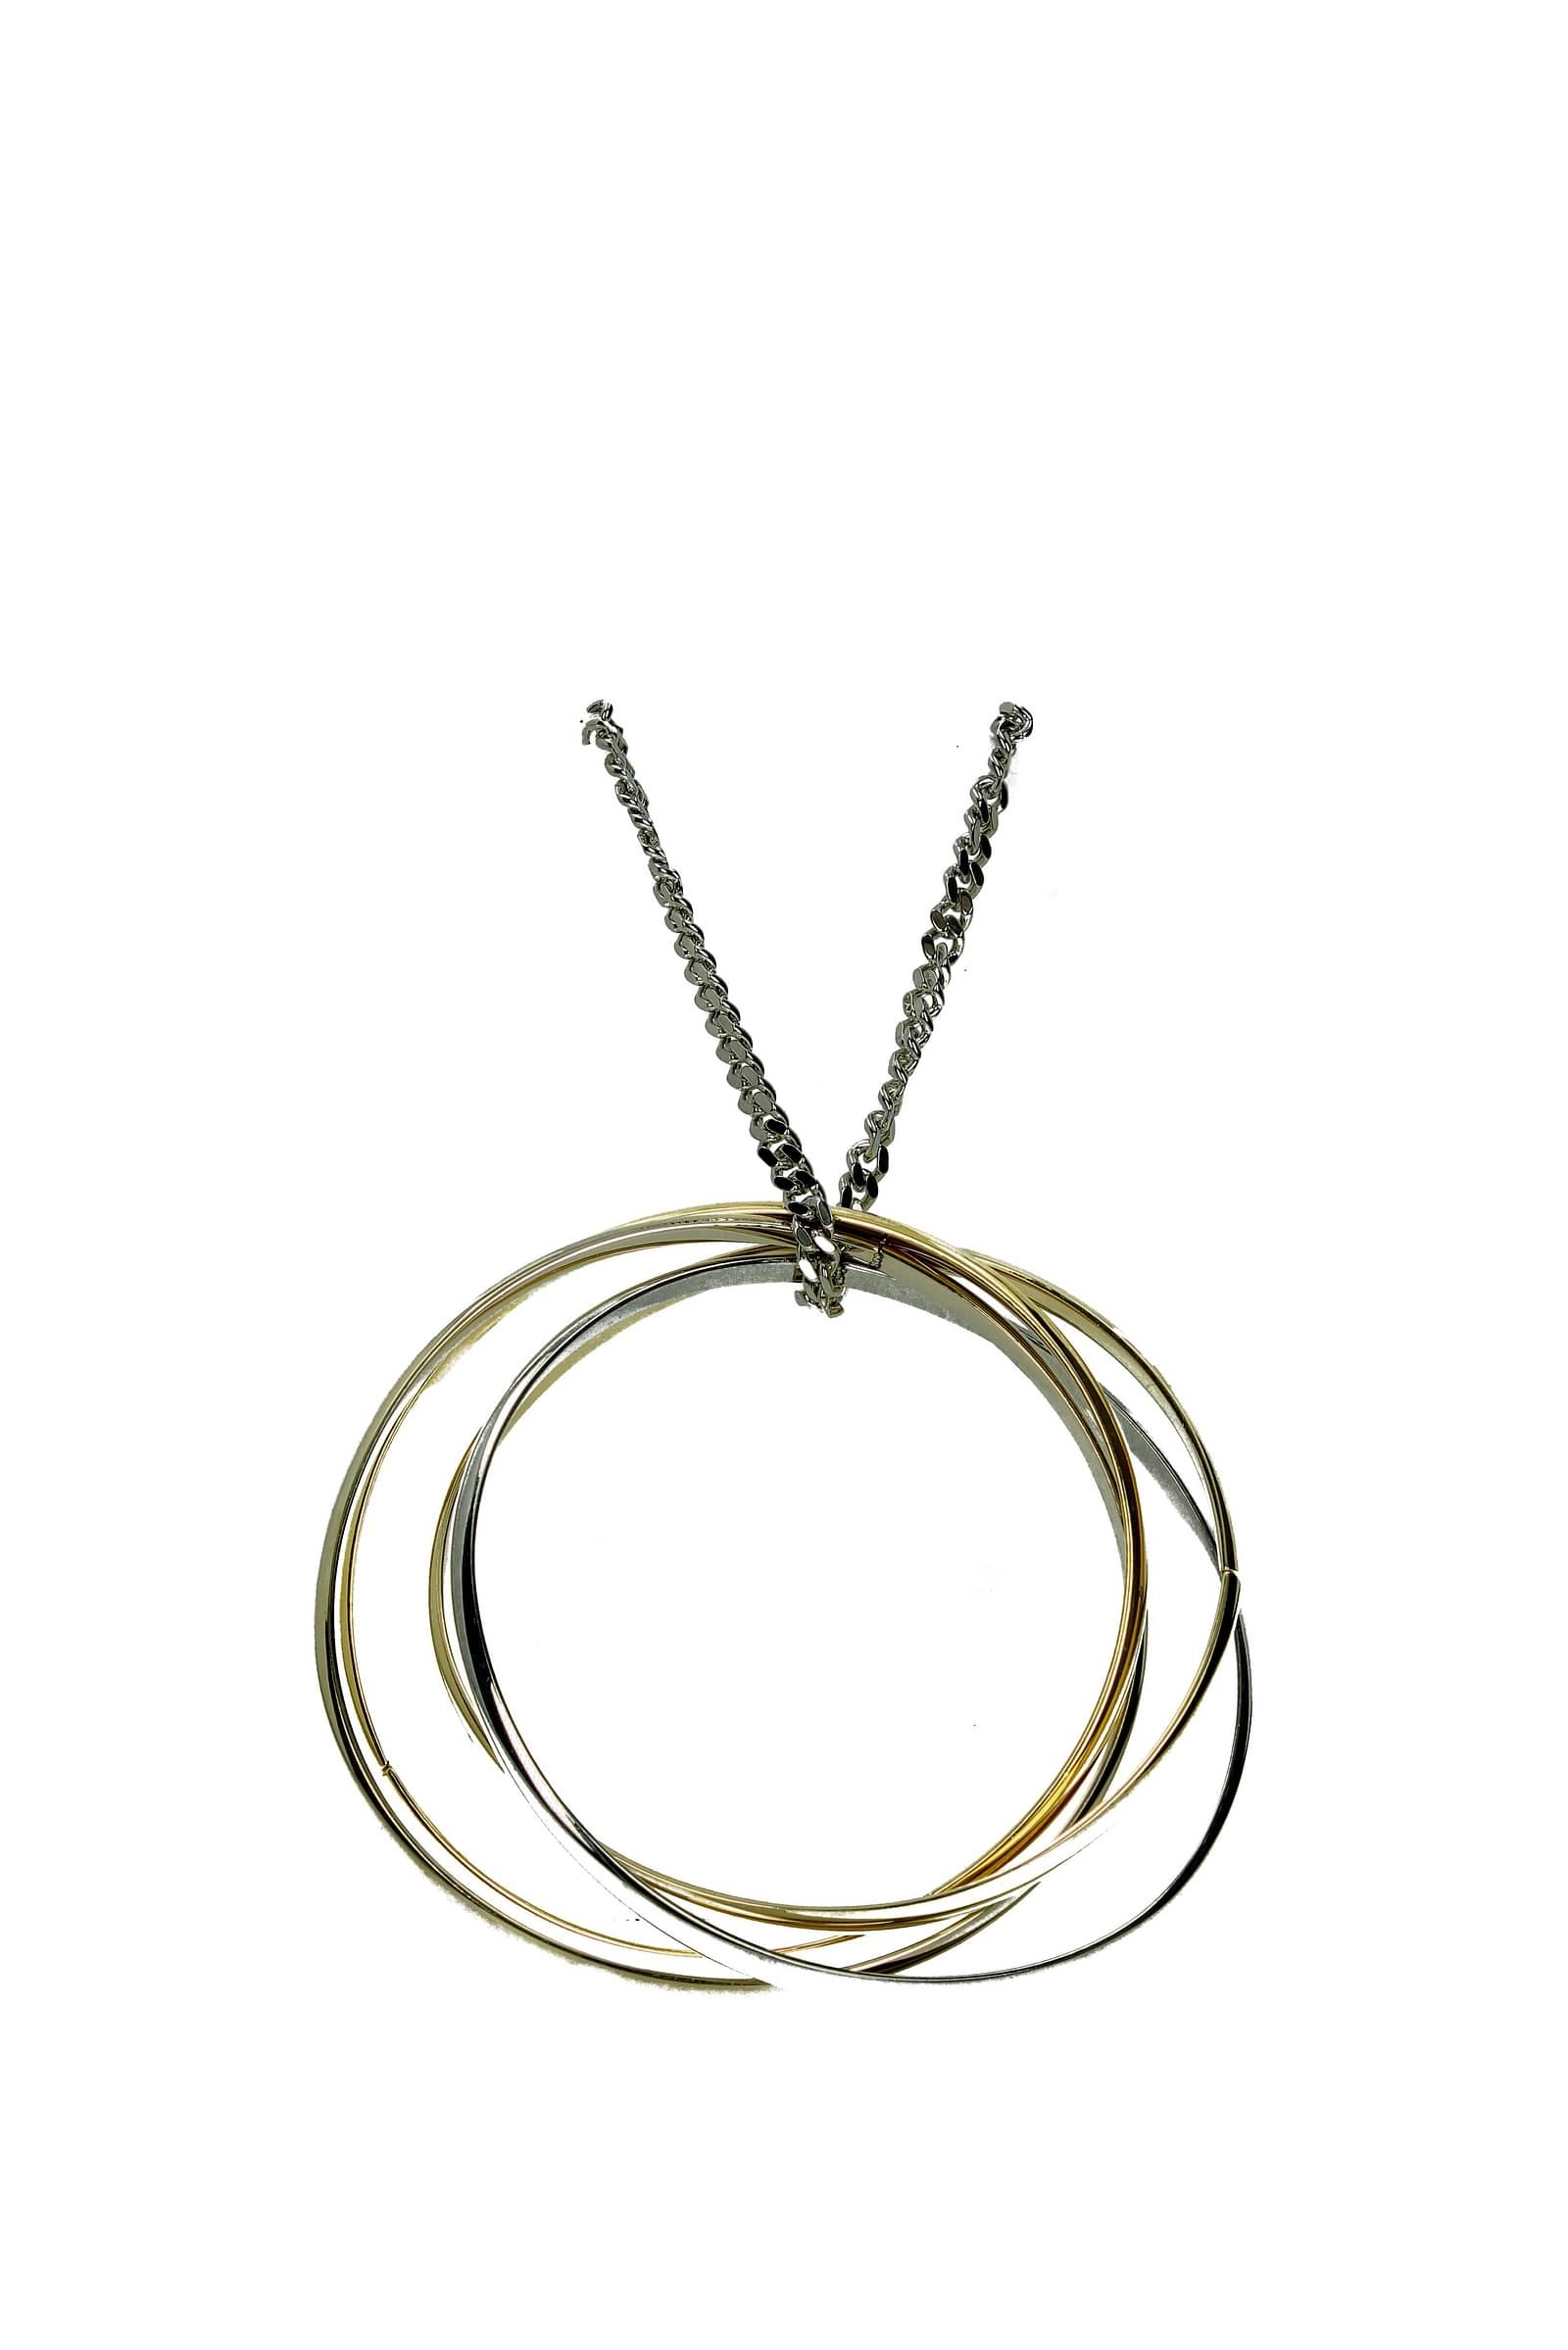 Collane-Givenchy-Donna-Ottone-BF03370900 miniatura 2